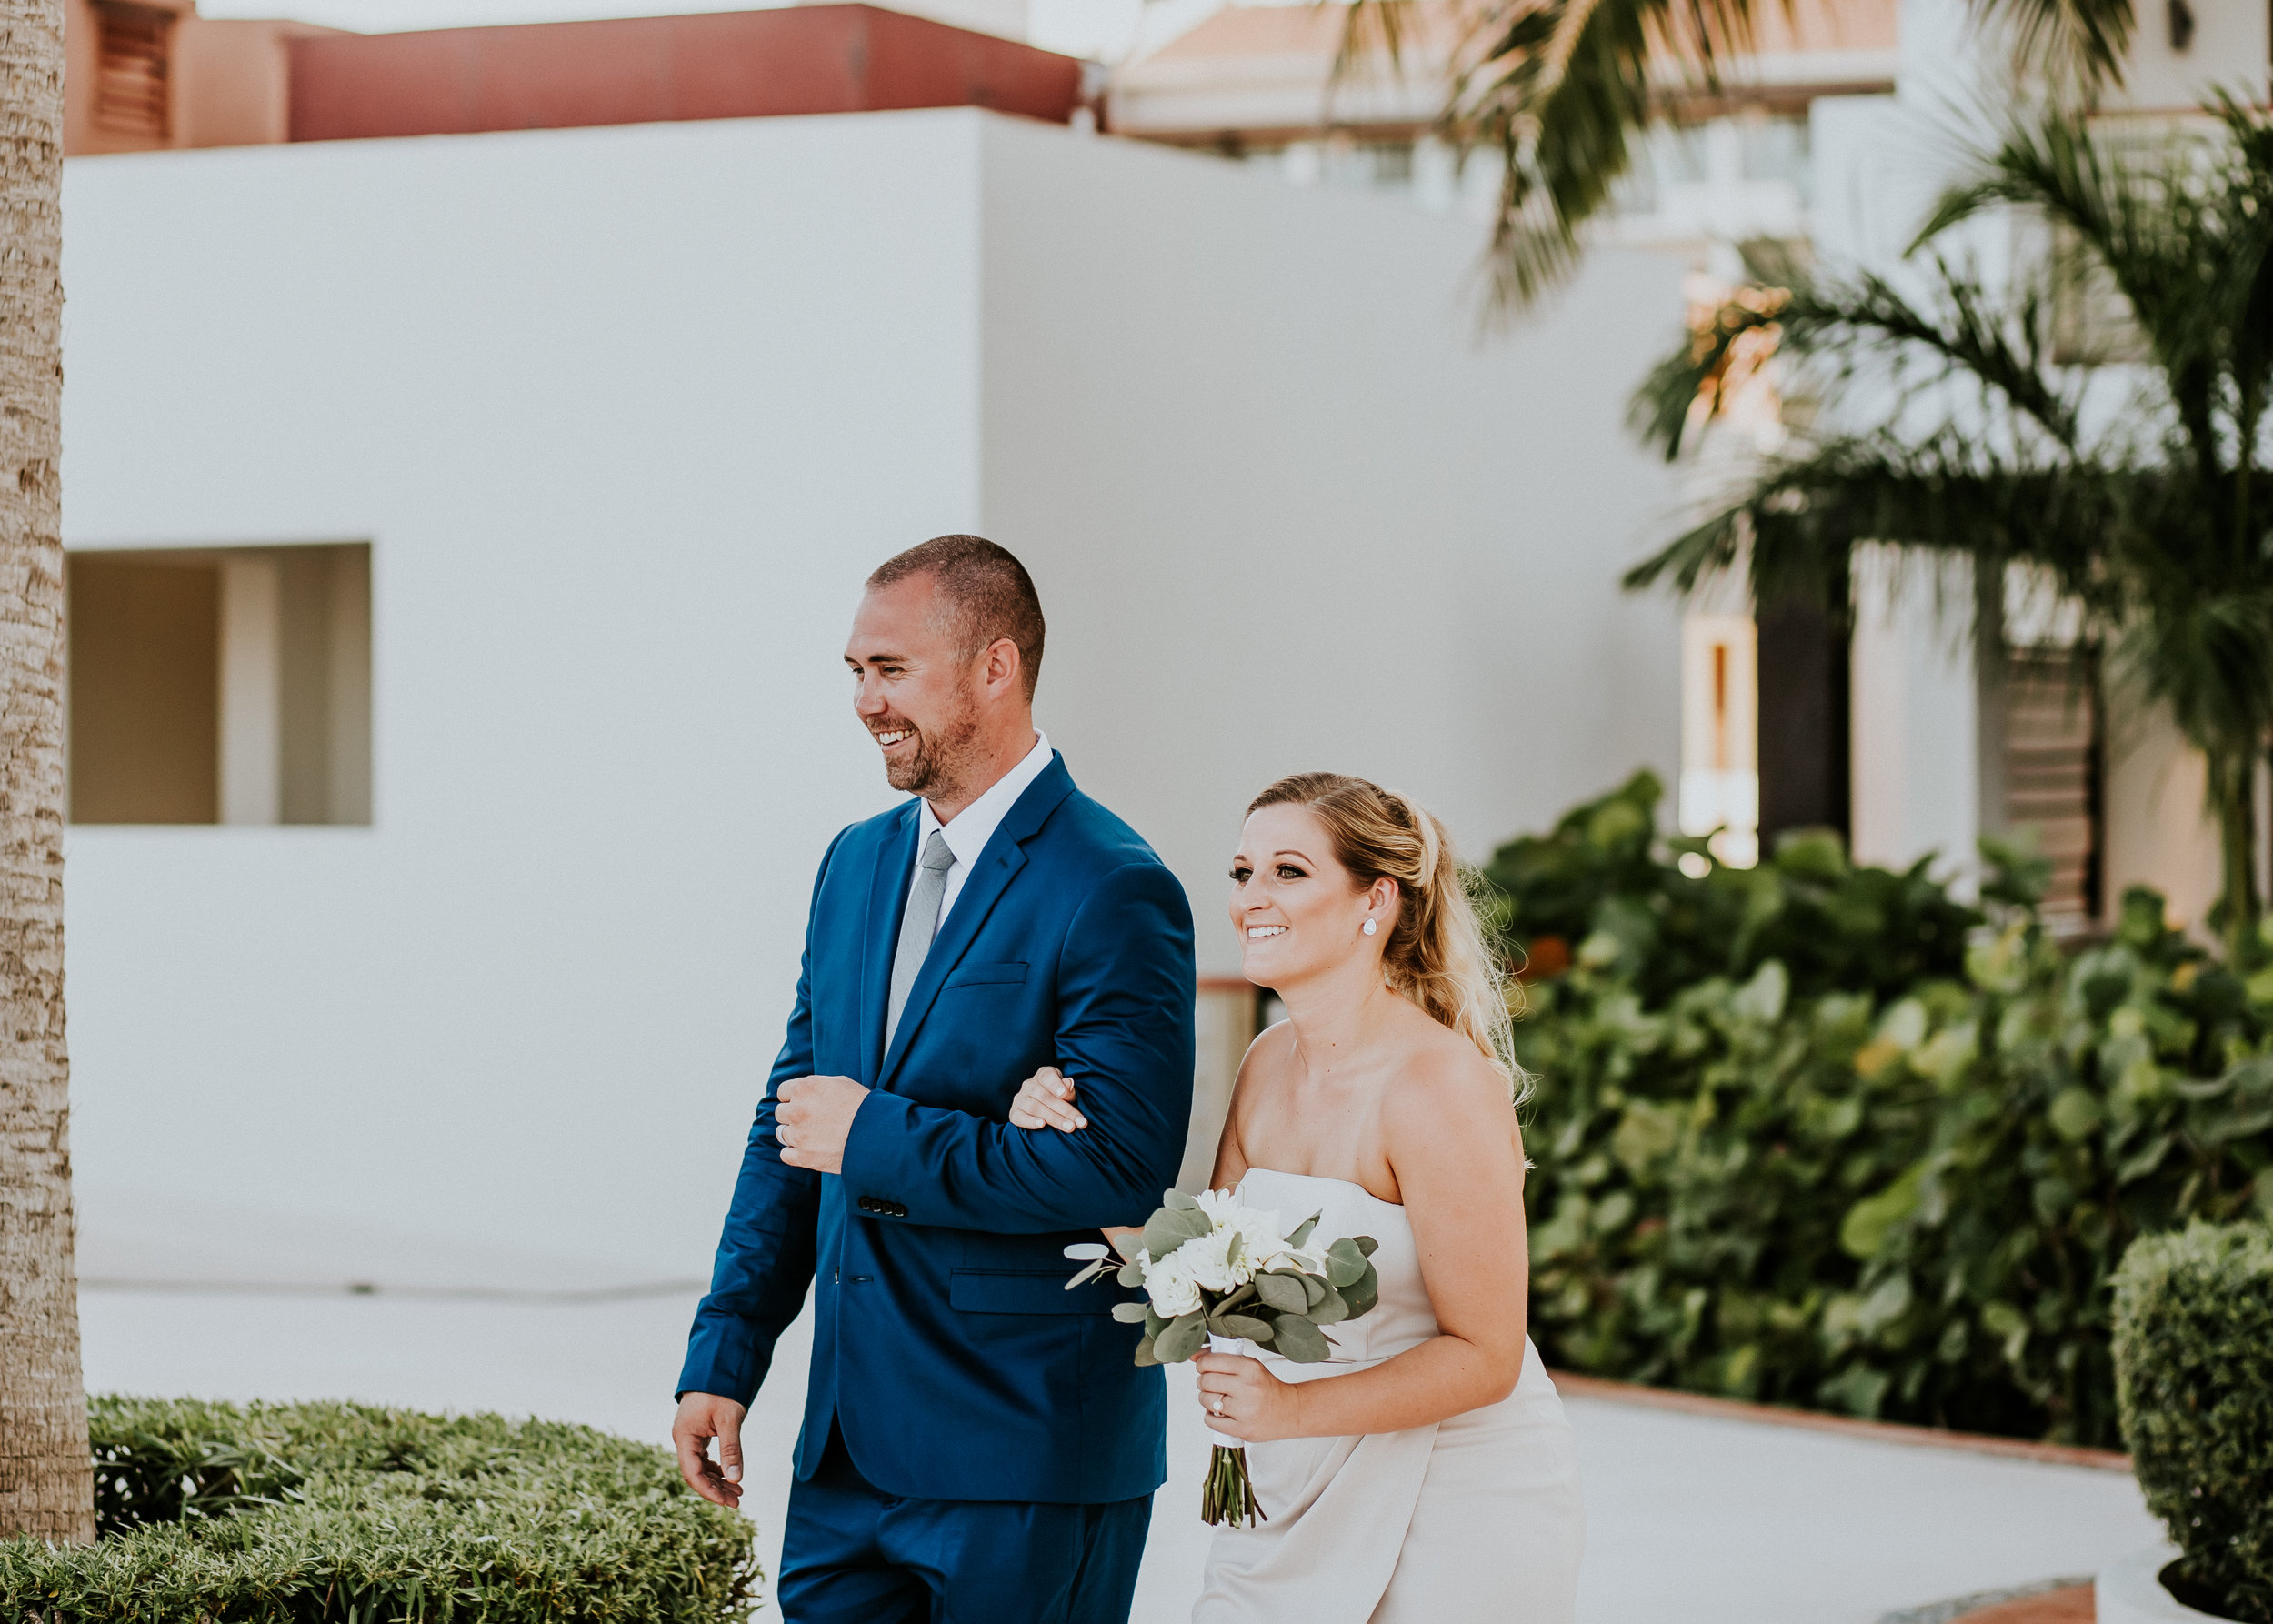 WeddingDay-105.jpg